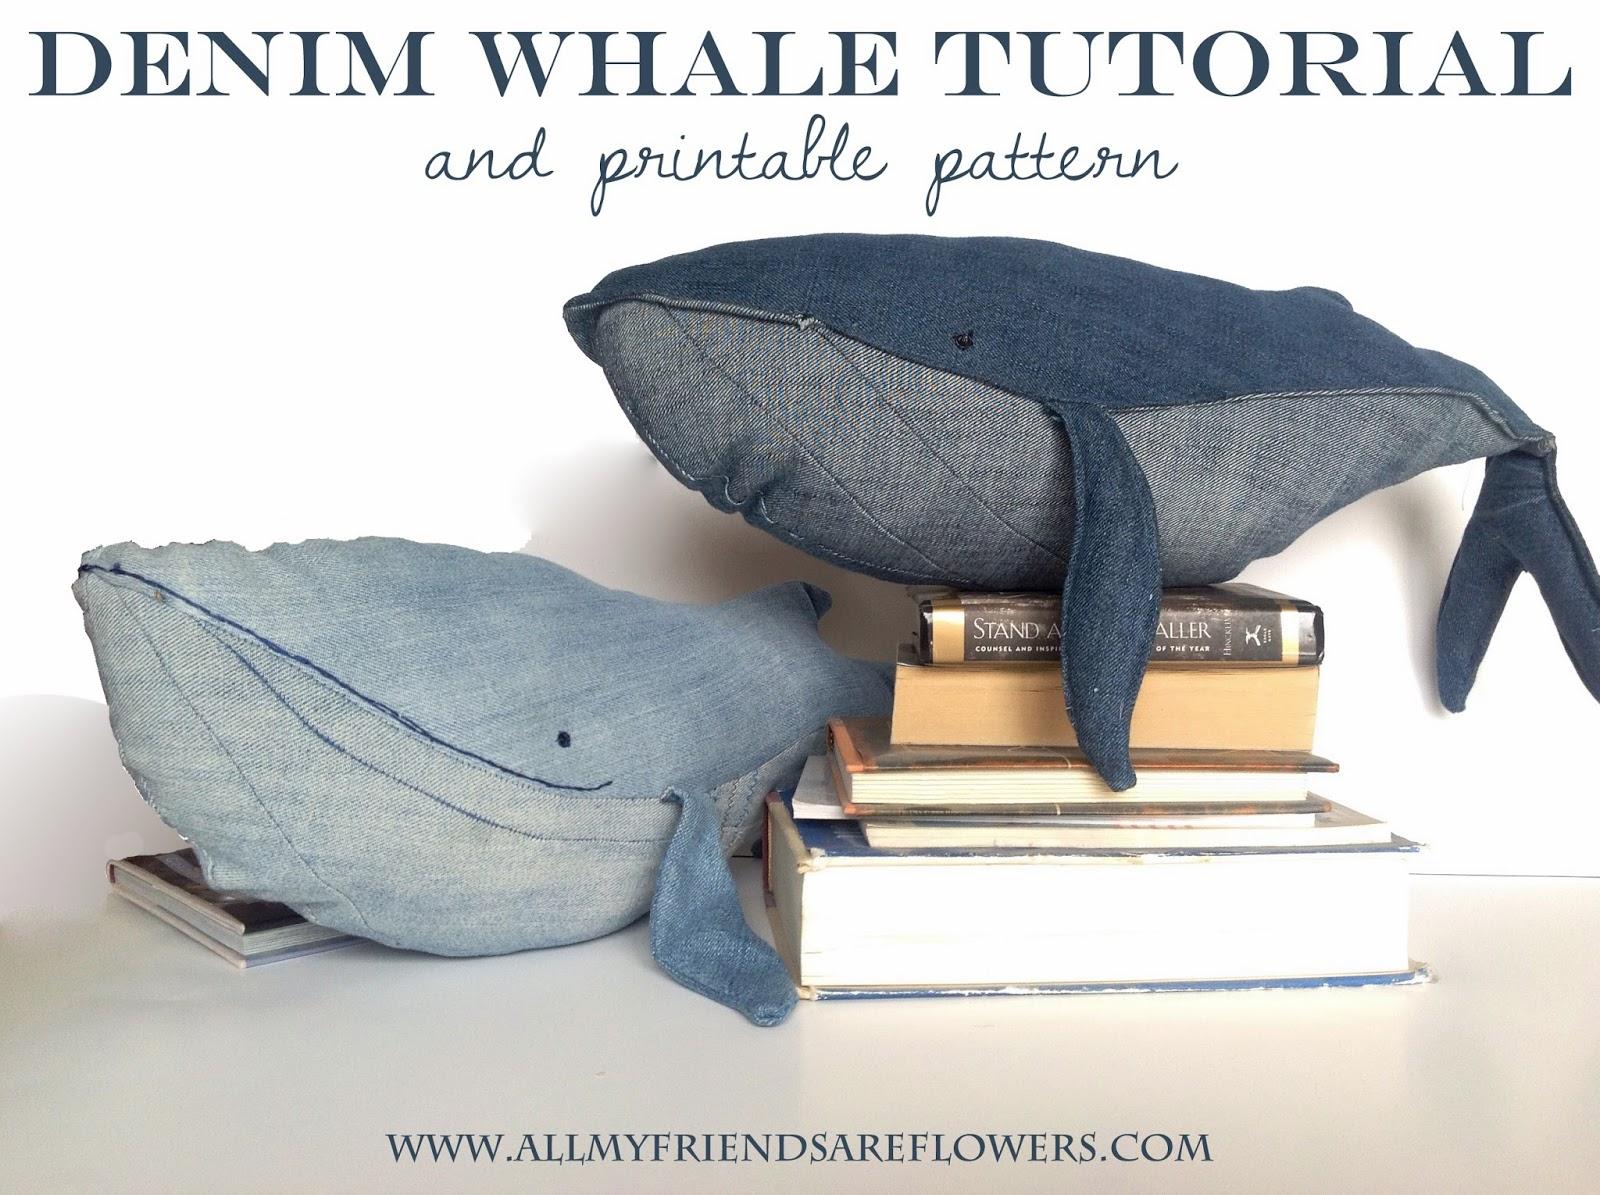 Denim Whale Tutorial & Printable Pattern